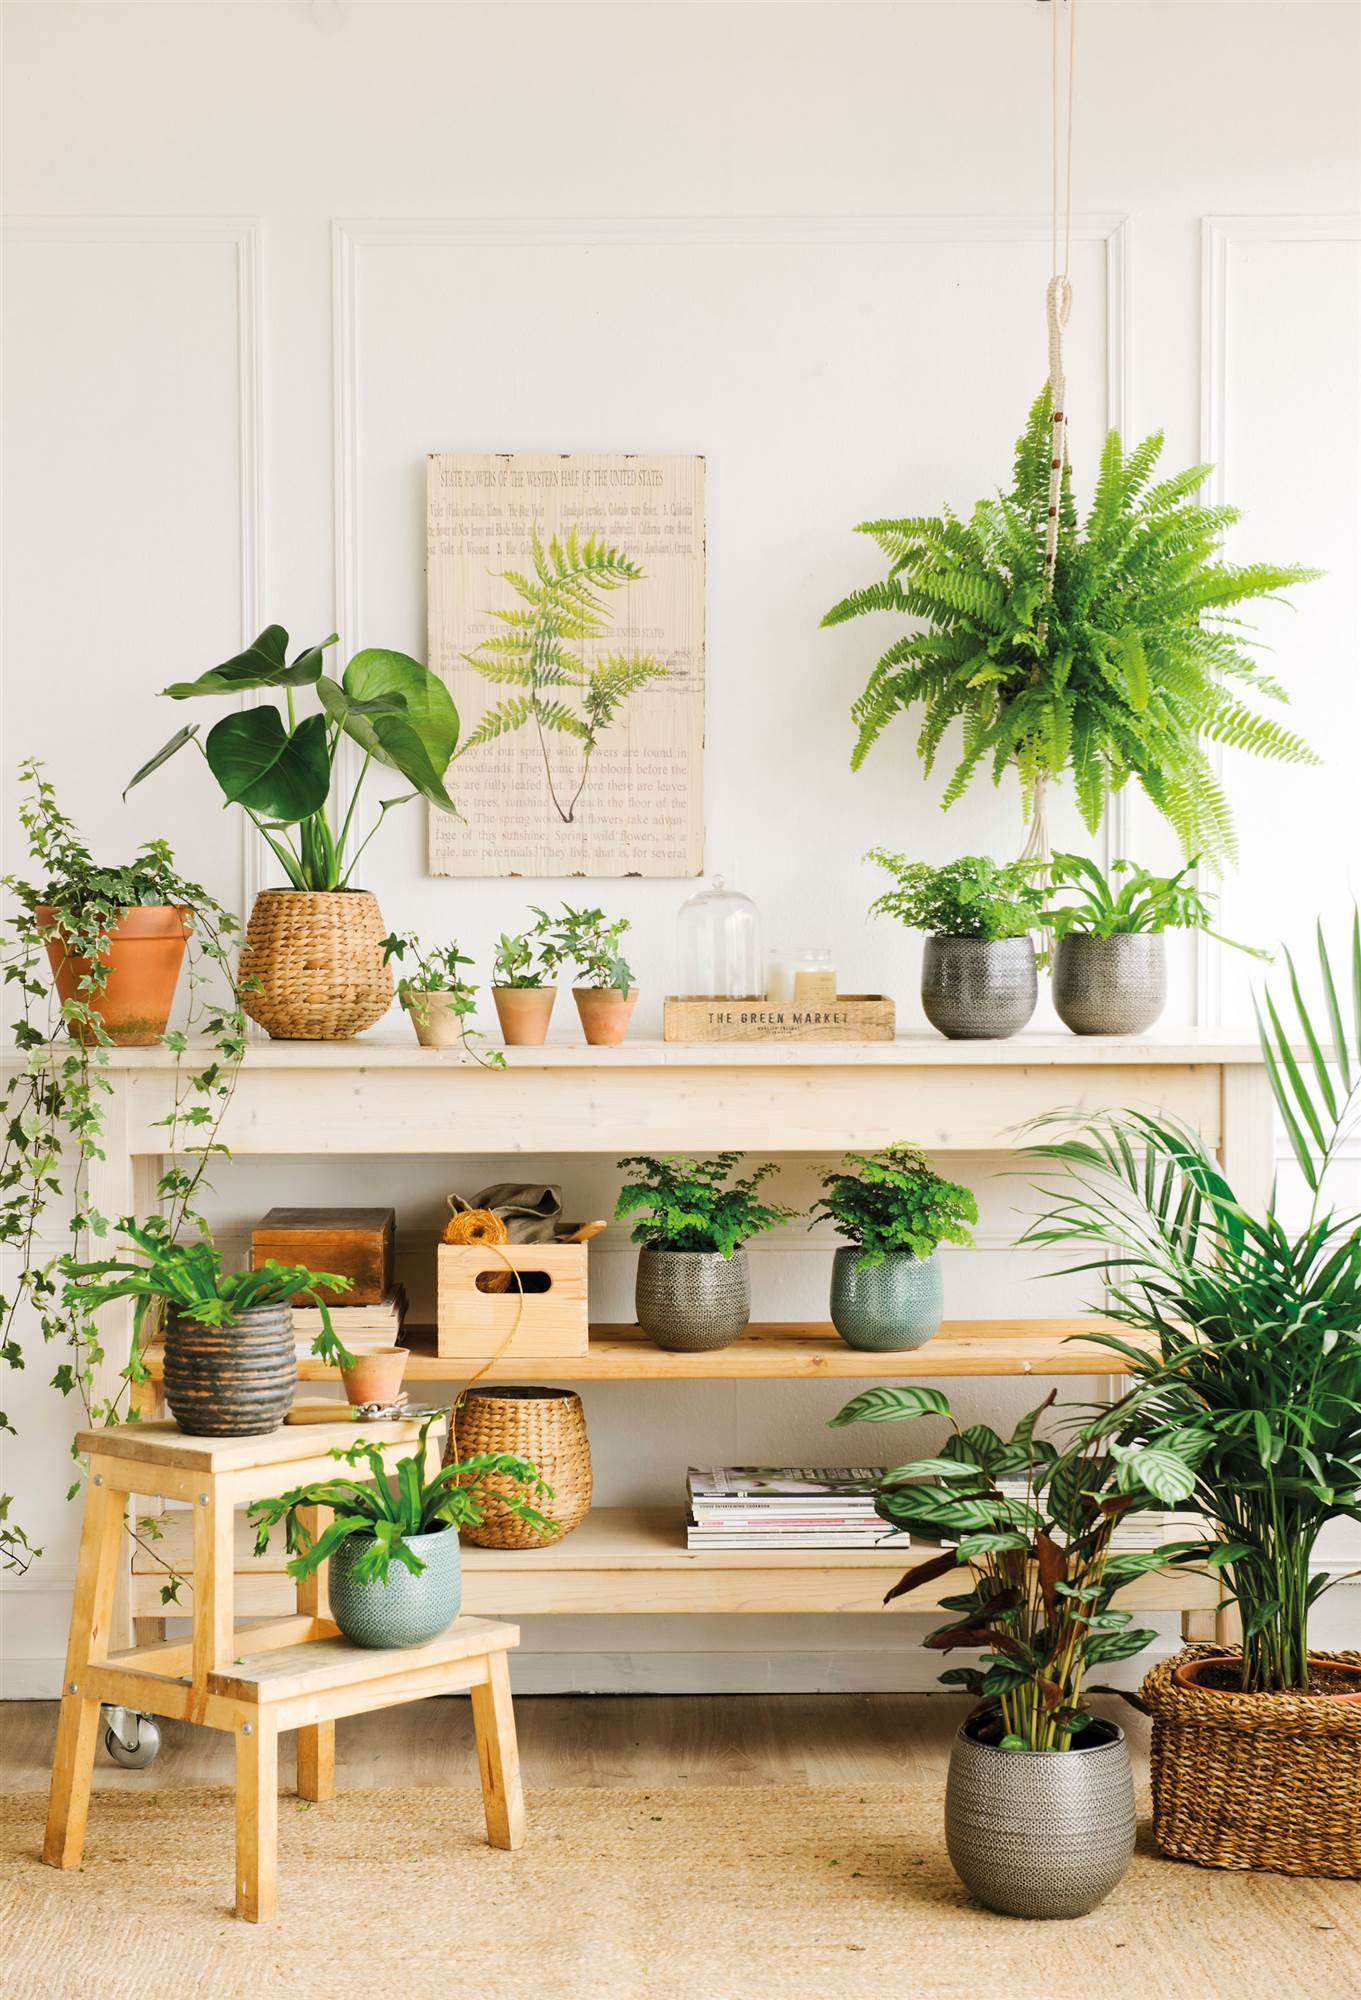 966 fotos de plantas - Estanterias para plantas ...